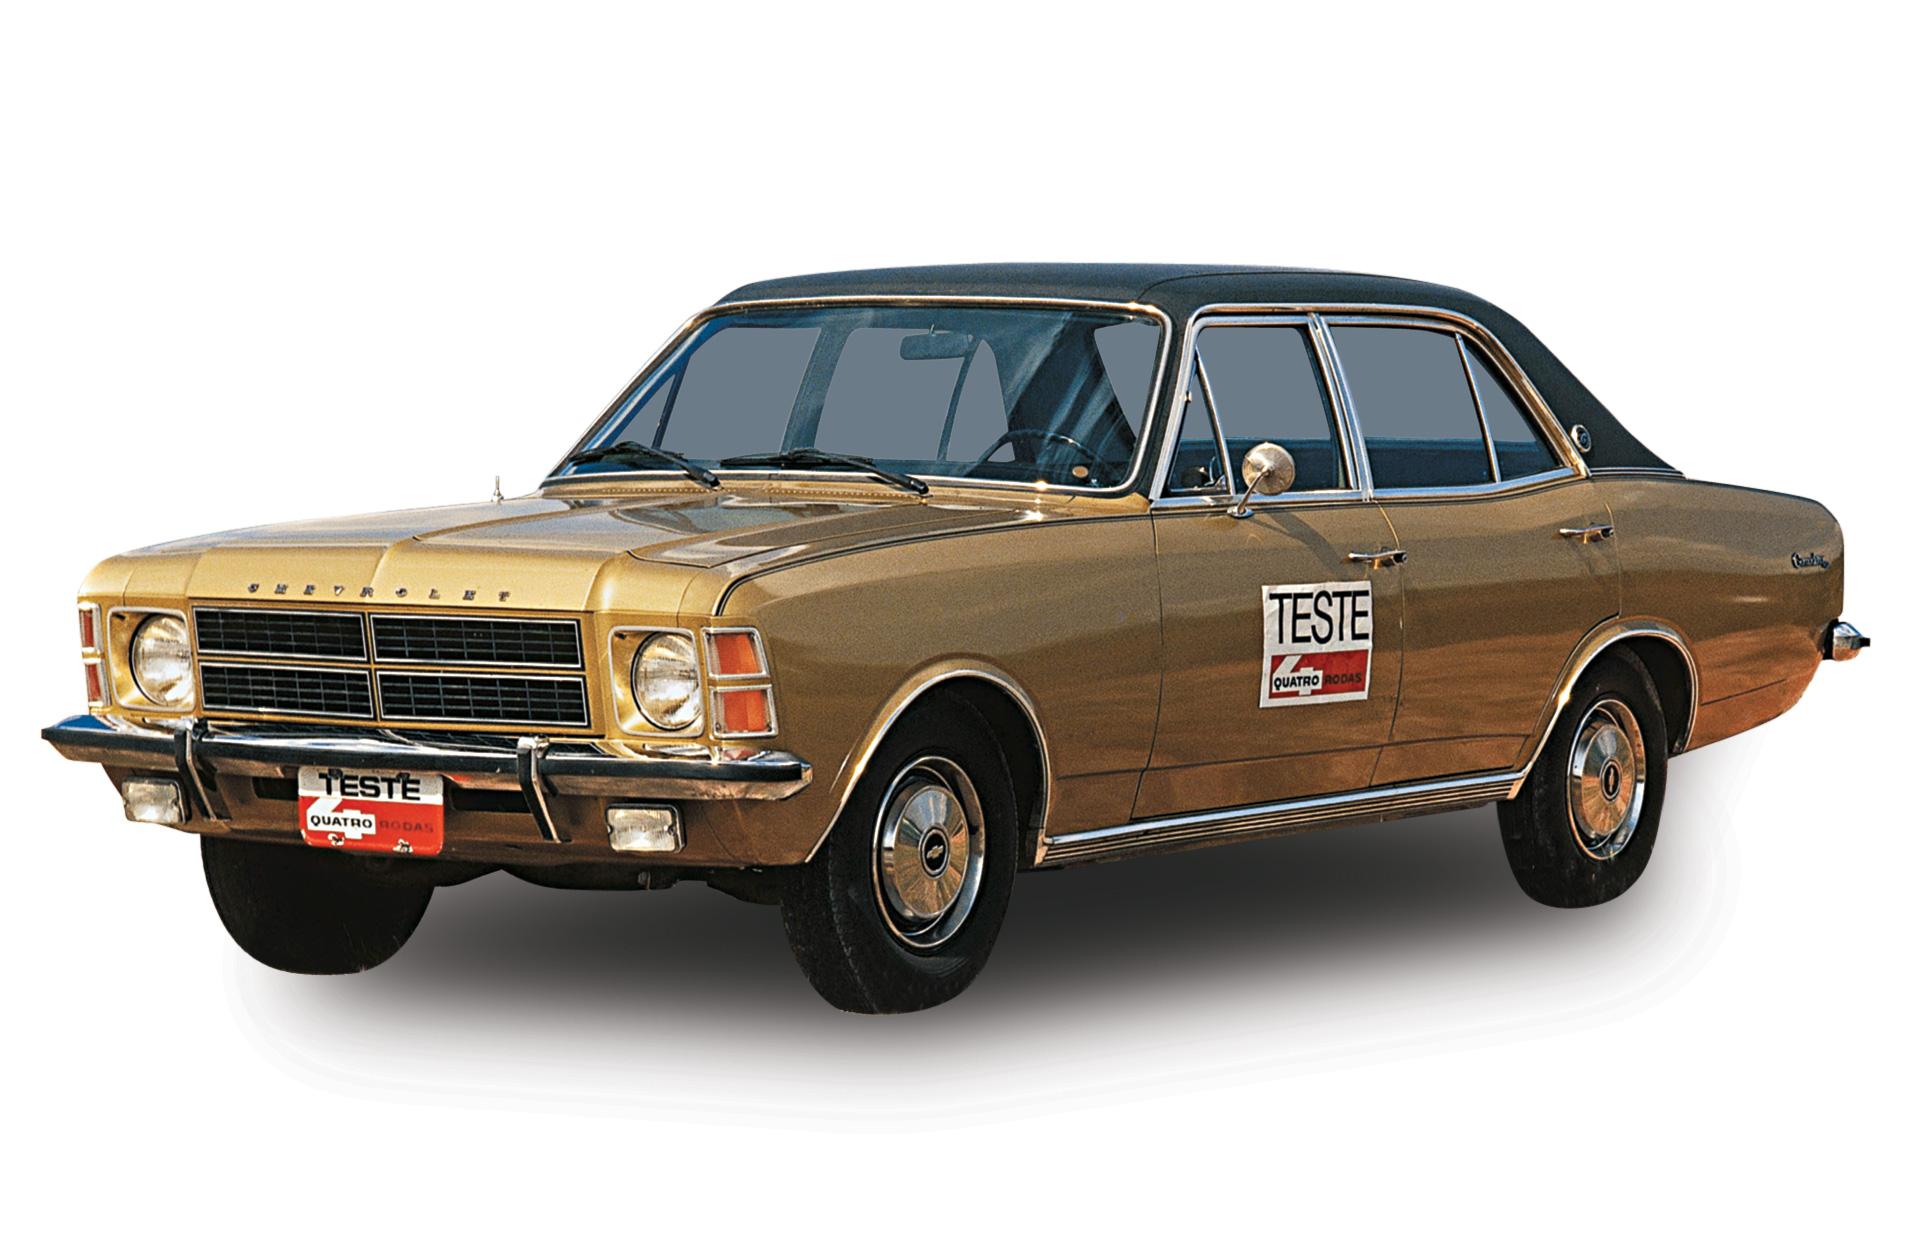 Teto de vinil do Chevrolet Opala